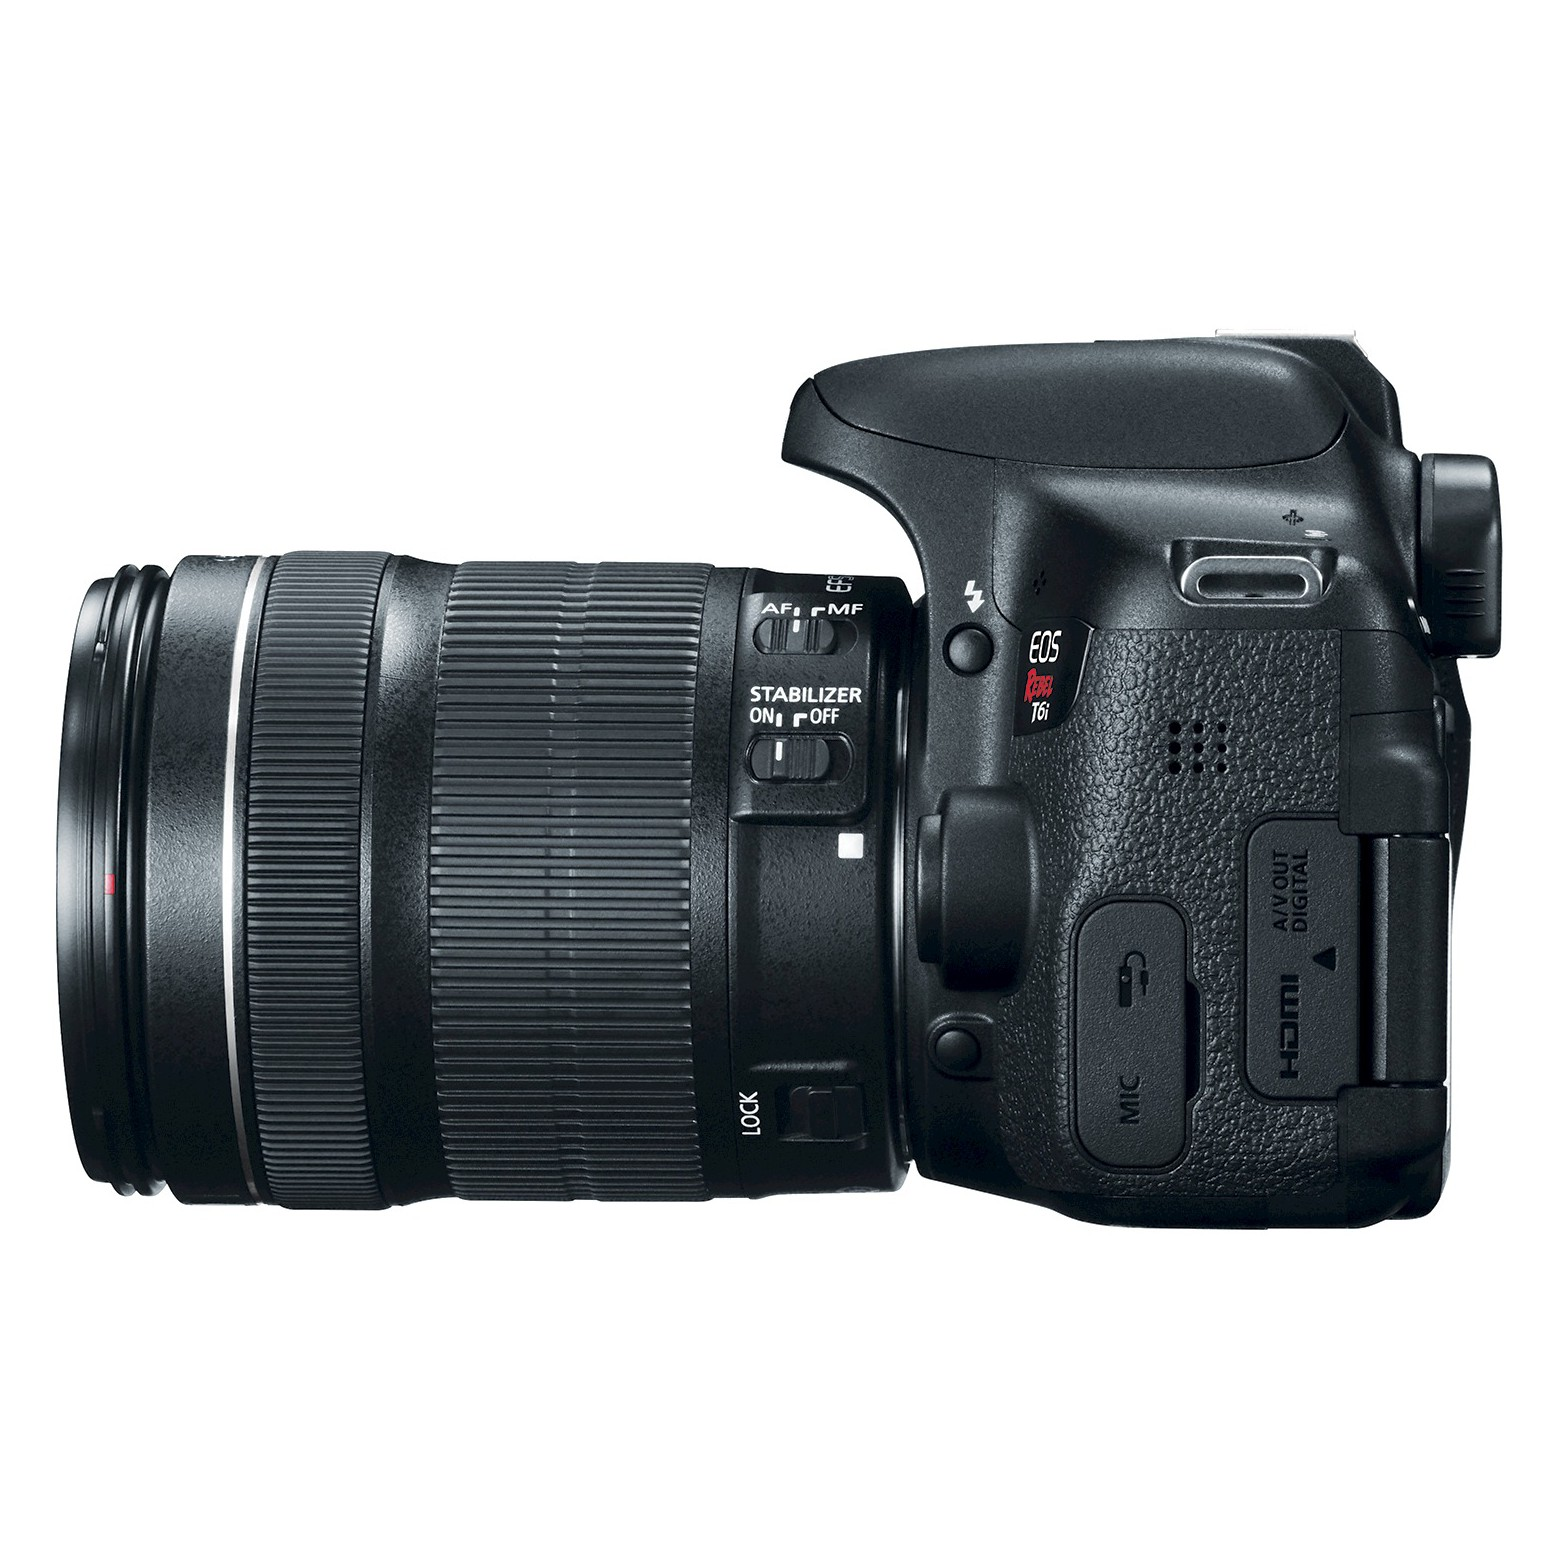 Canon Eos Rebel T6i Dslr Camera With 18 55mm Lens 750d Kit Ef S18 Is Stm Eos750d 750 D